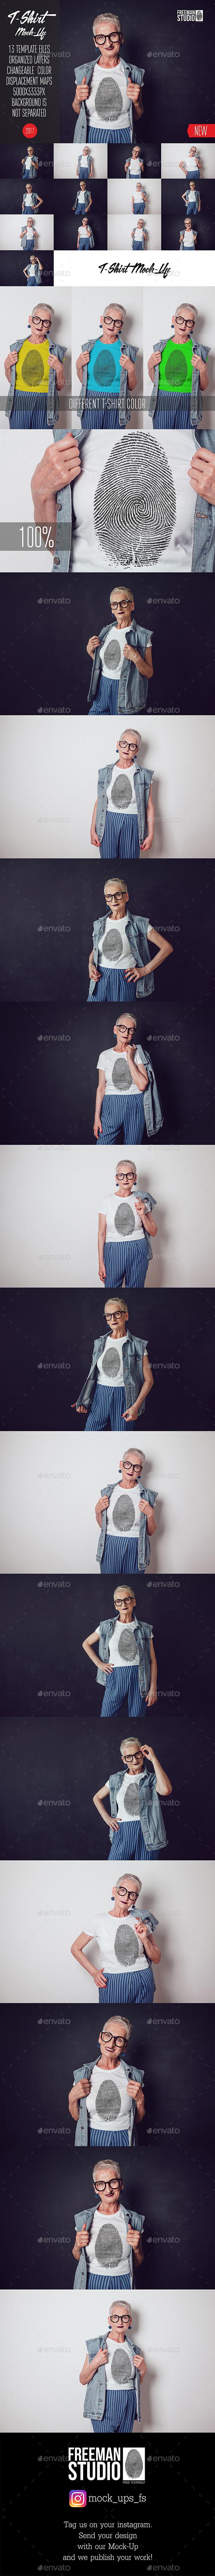 Old Woman T-Shirt Mock-Up - Product Mock-Ups Graphics